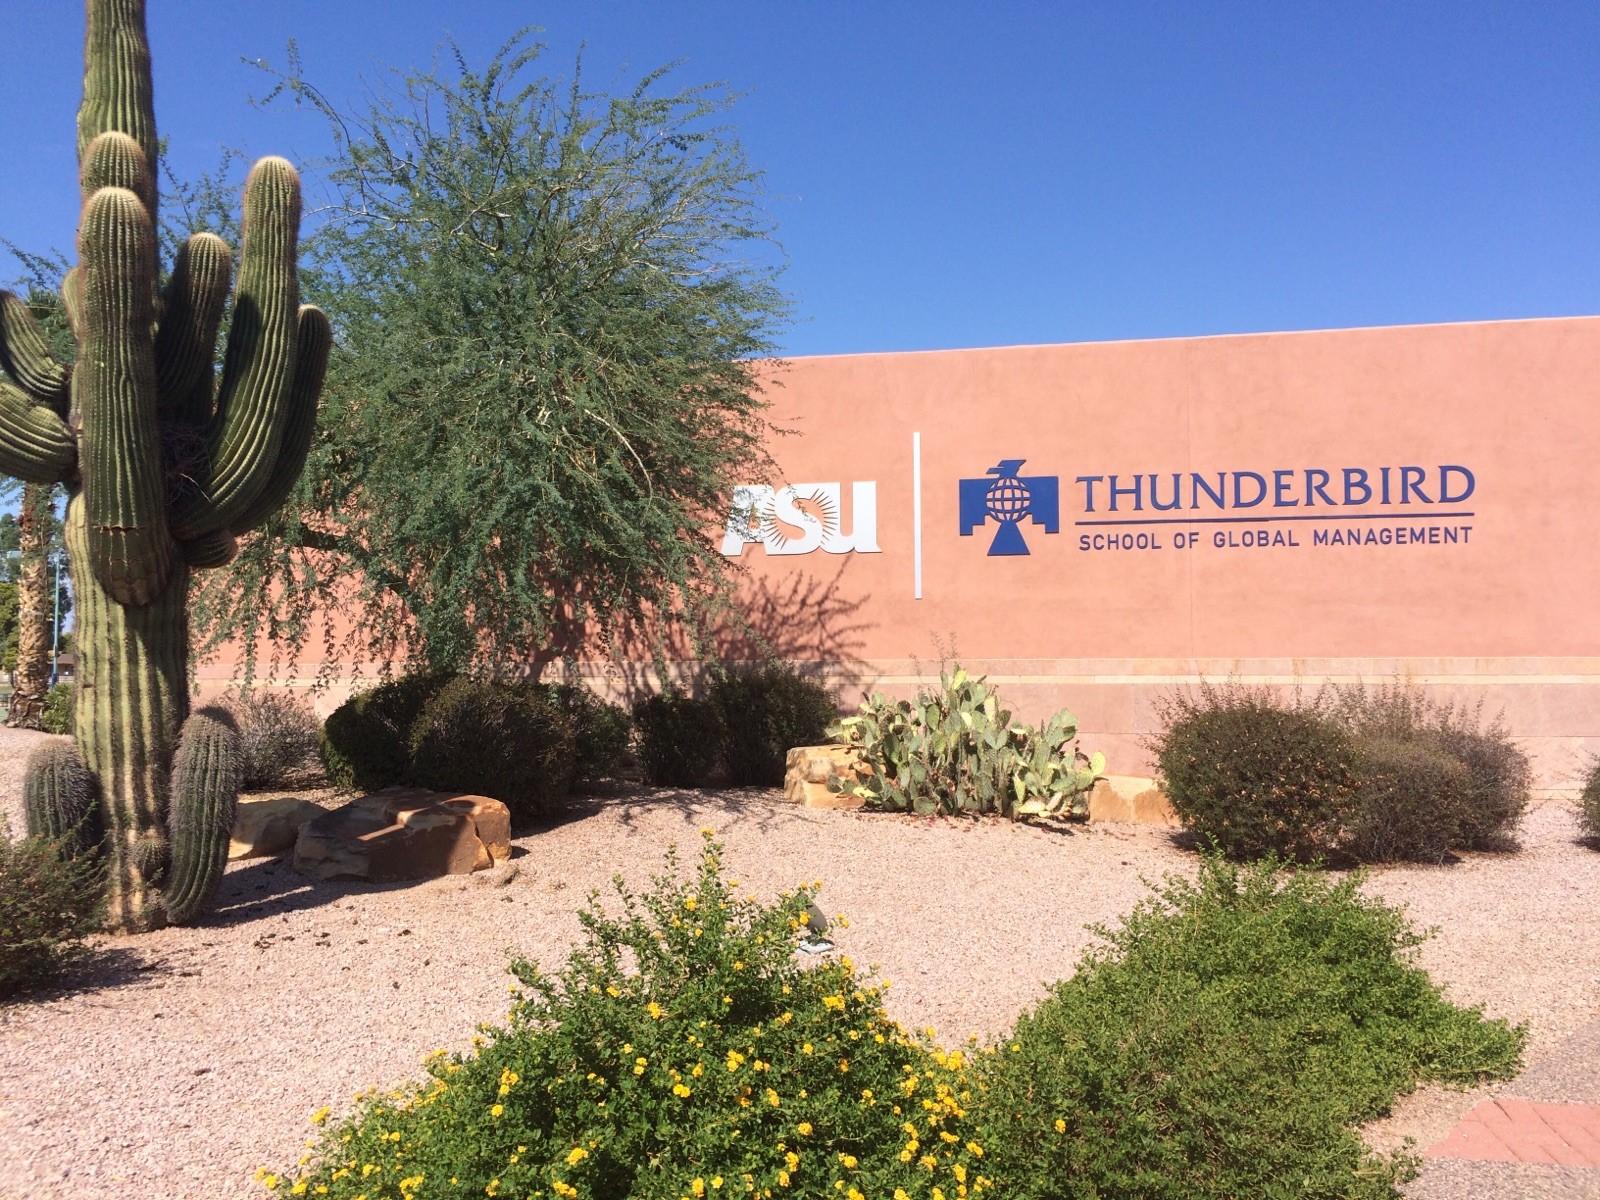 thunderbird school of global management reviews